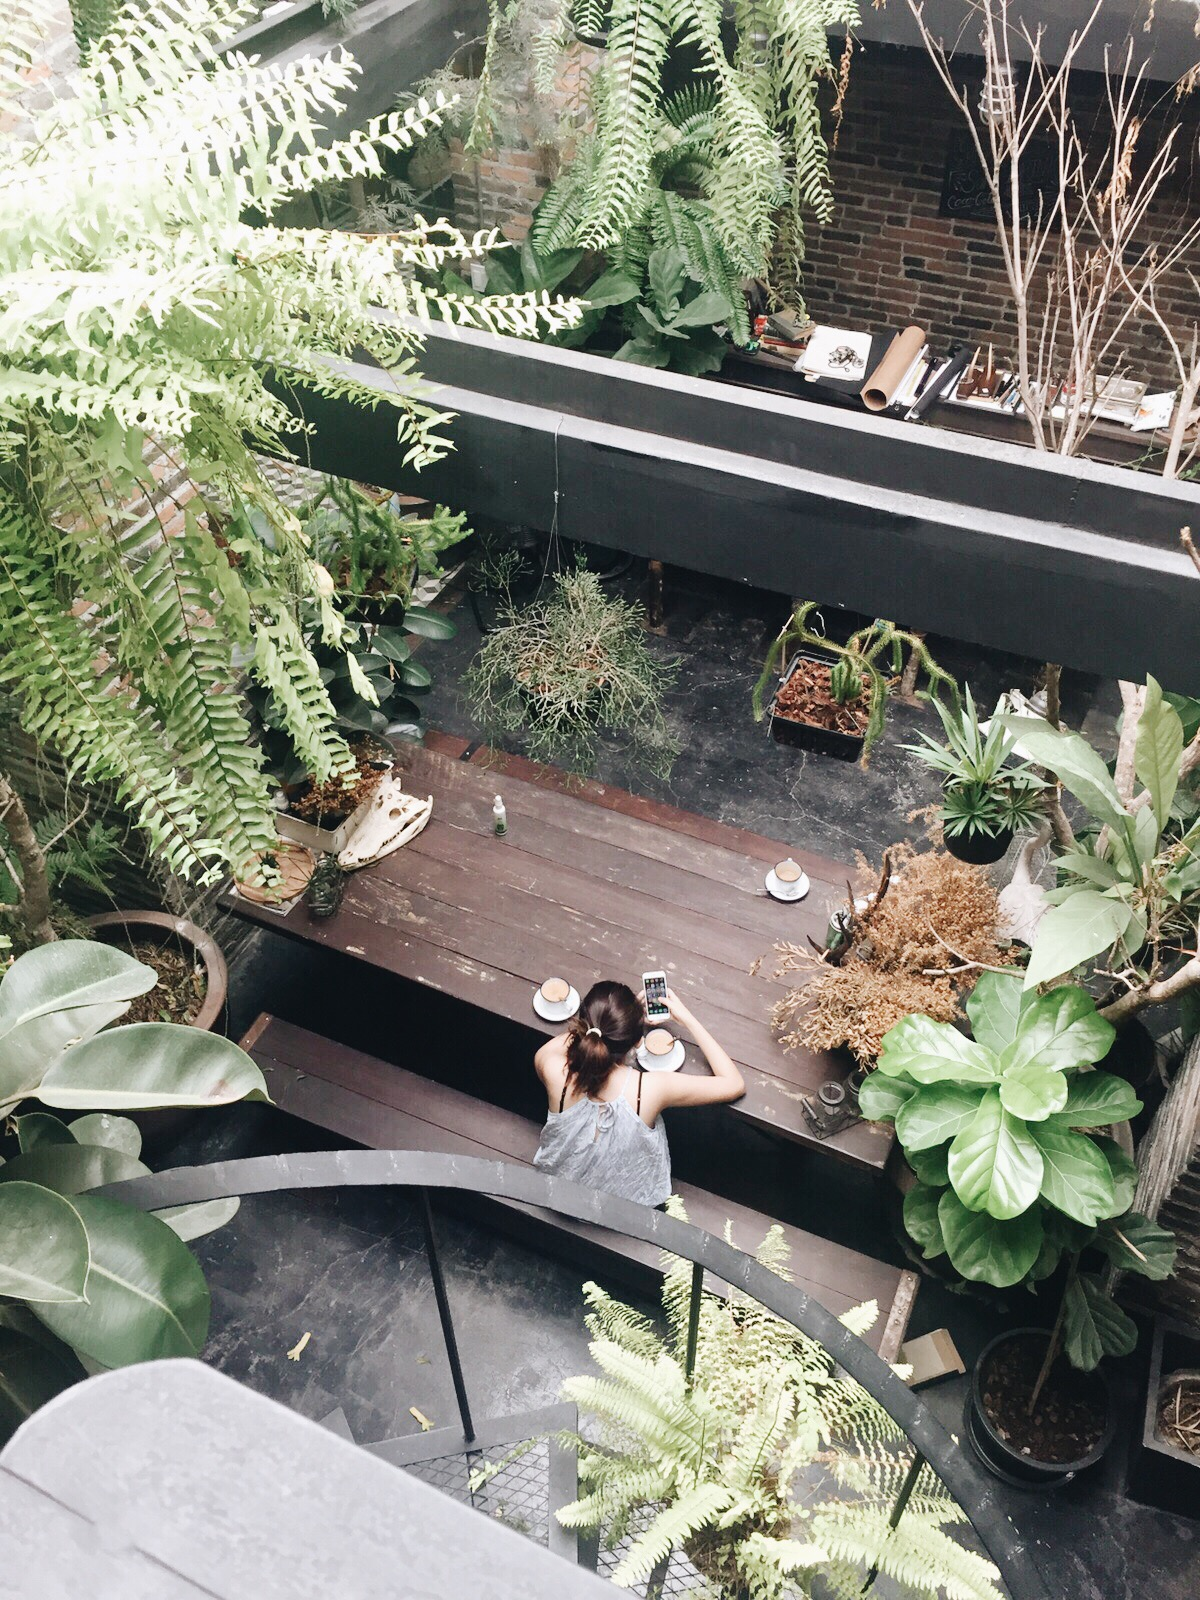 Bangkok Trip! Travelogue